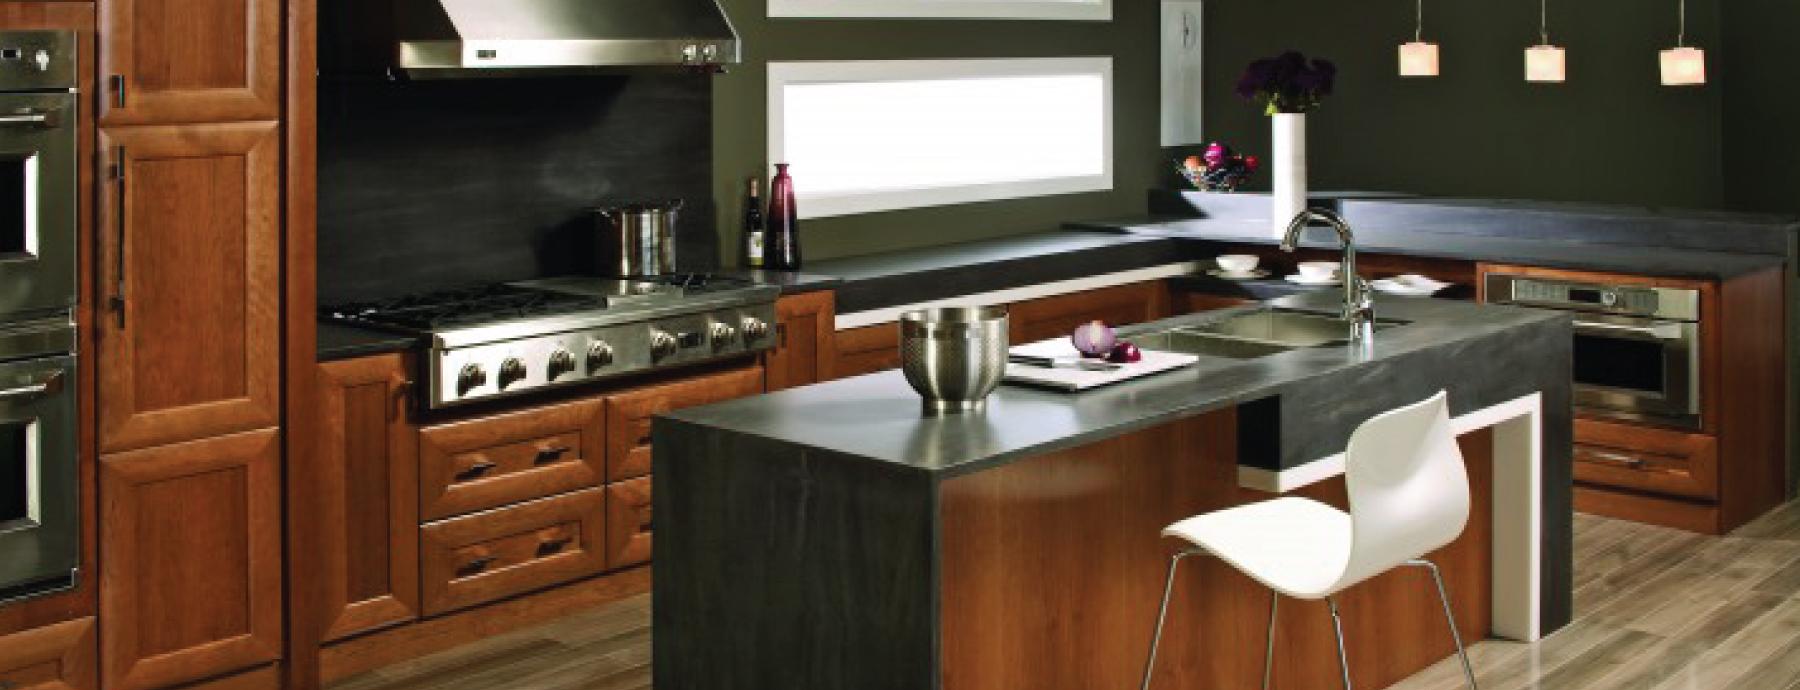 Interior Kitchen Cabinets Las Vegas Nv home kitchenland las vegas nevada 89118